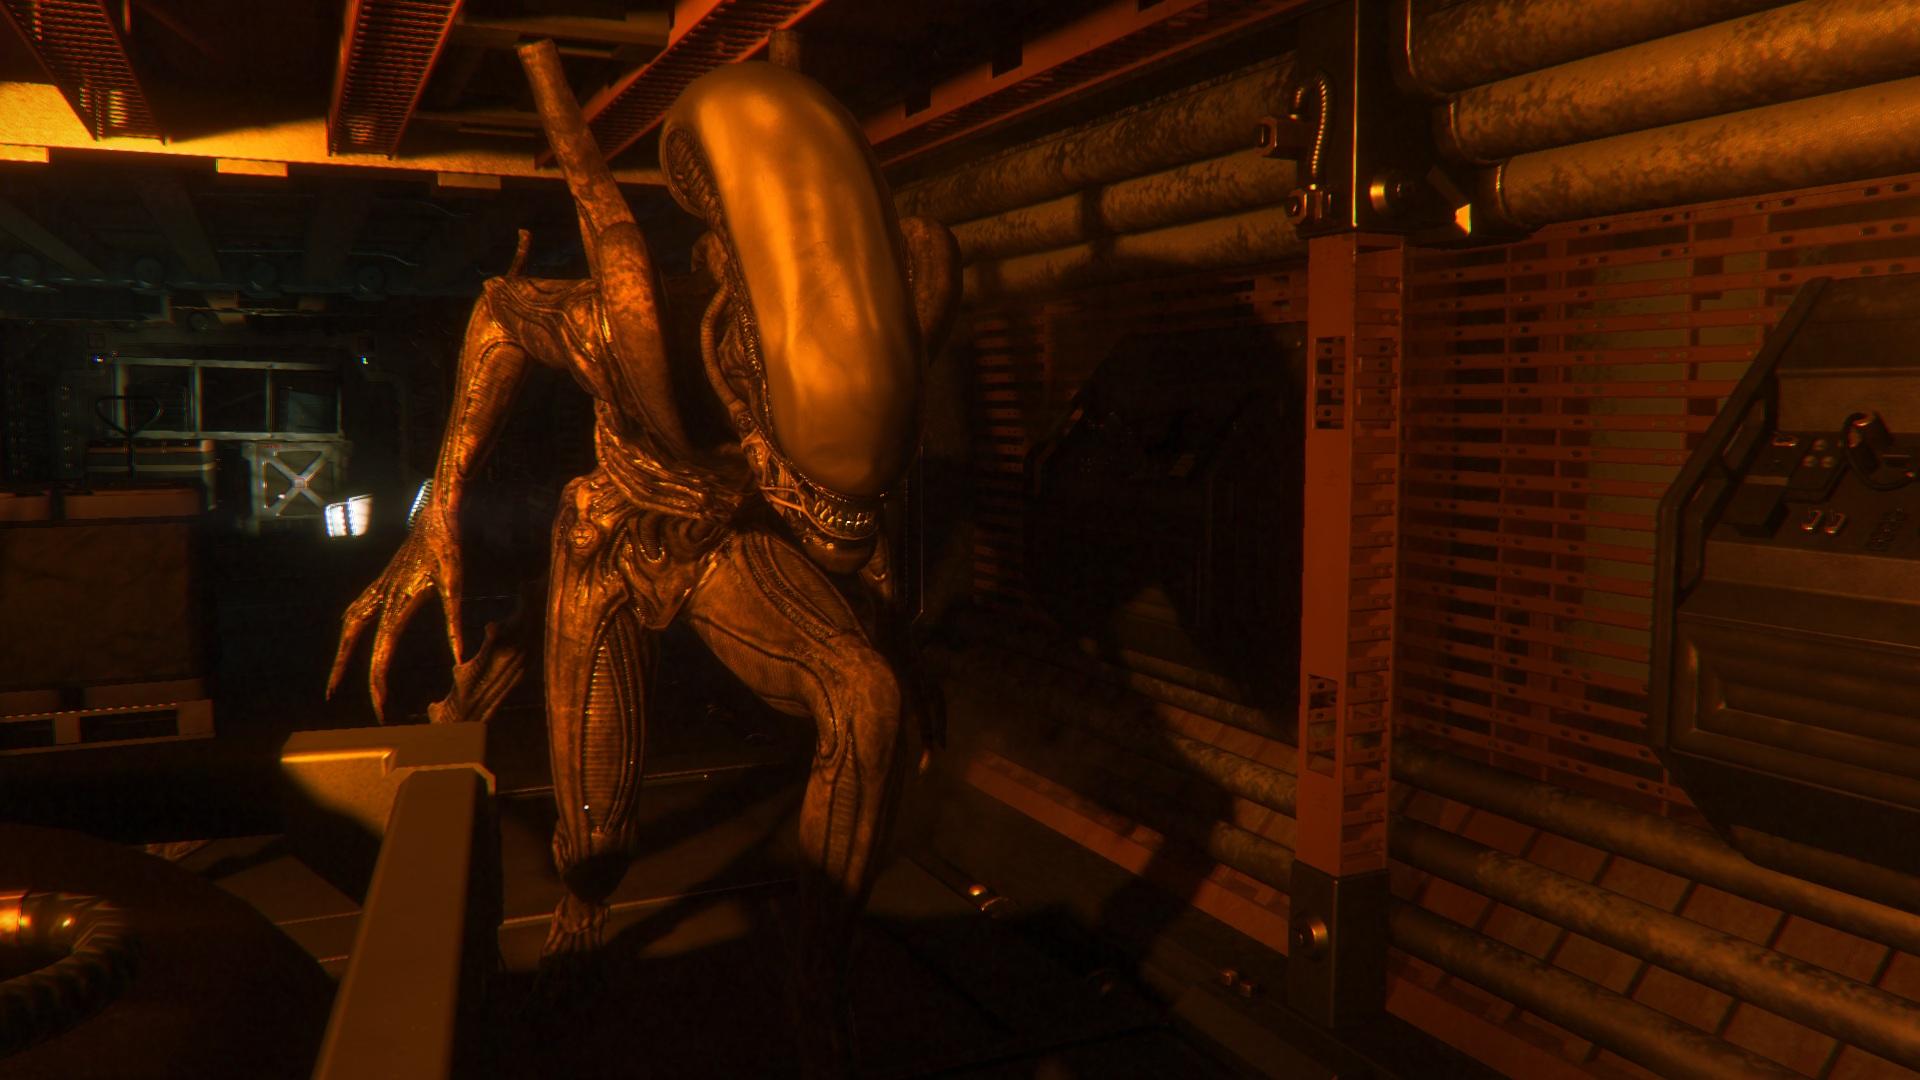 Illusion Wallpaper 3d Alien Isolation Test Tipps Videos News Release